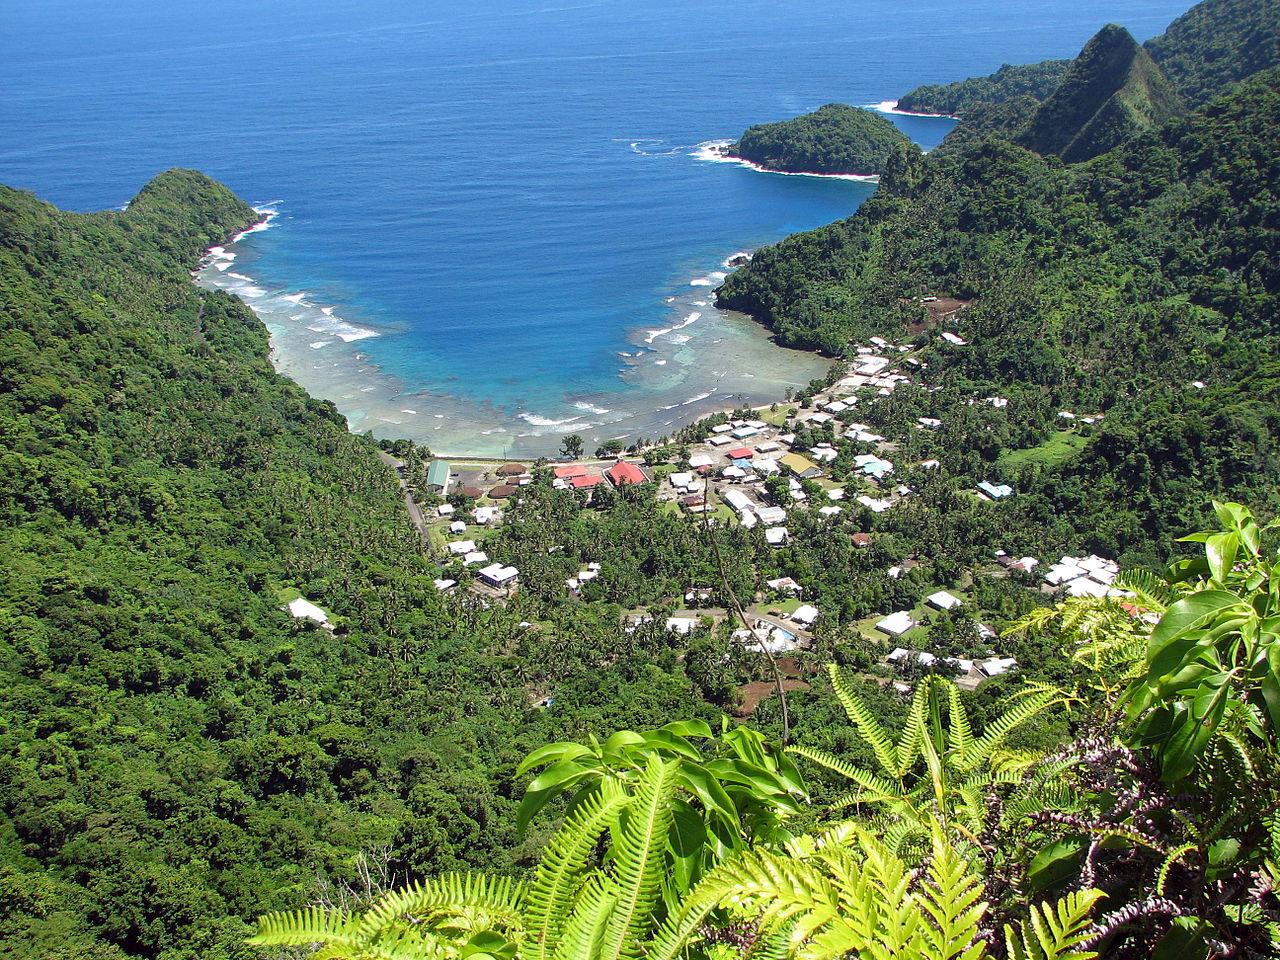 Afono village, Tutuila island, American Samoa